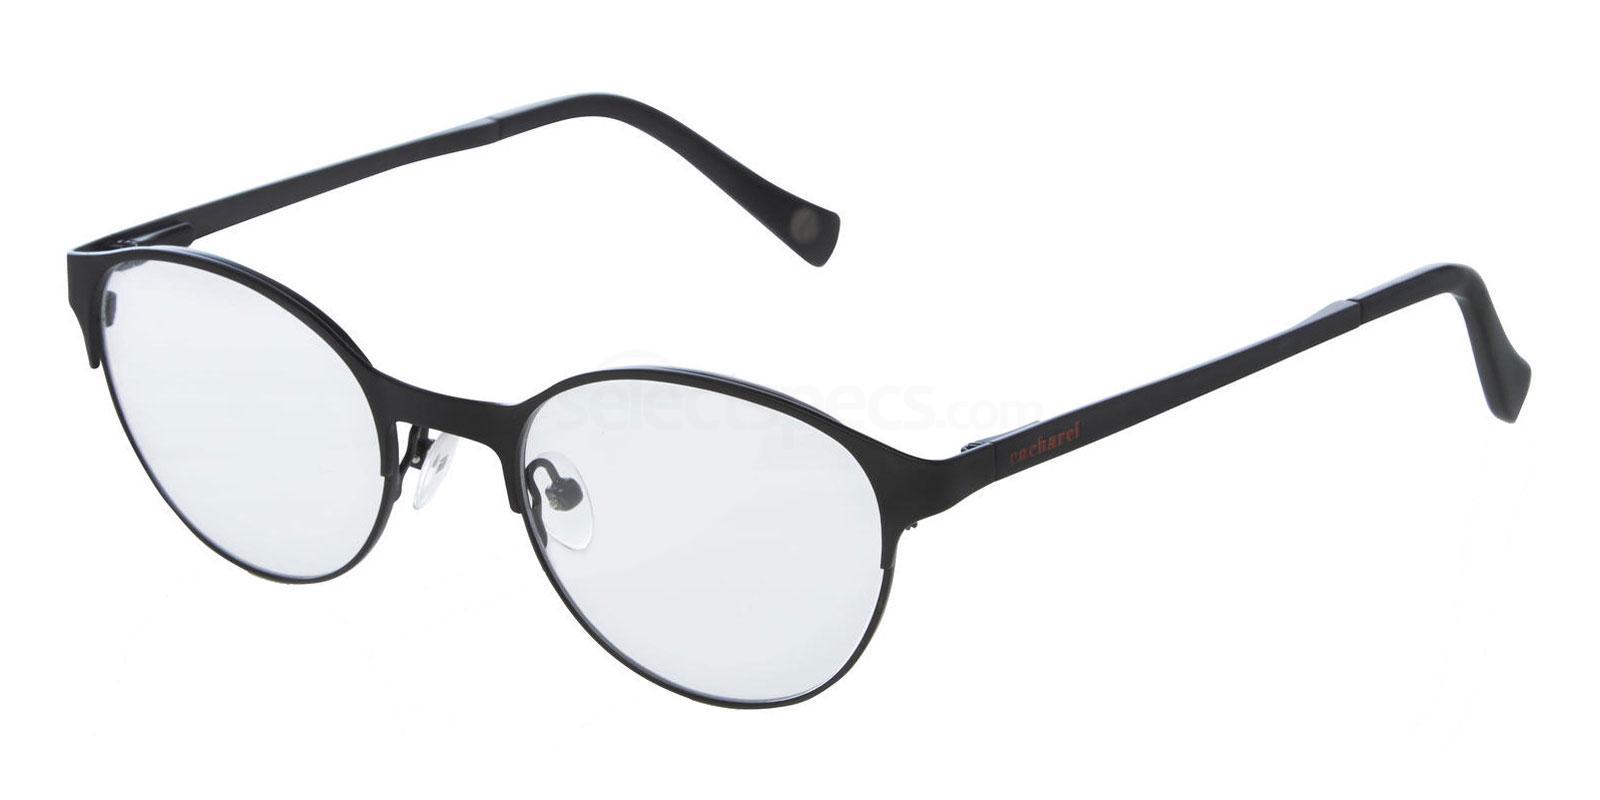 001 CA1017 Glasses, Cacharel